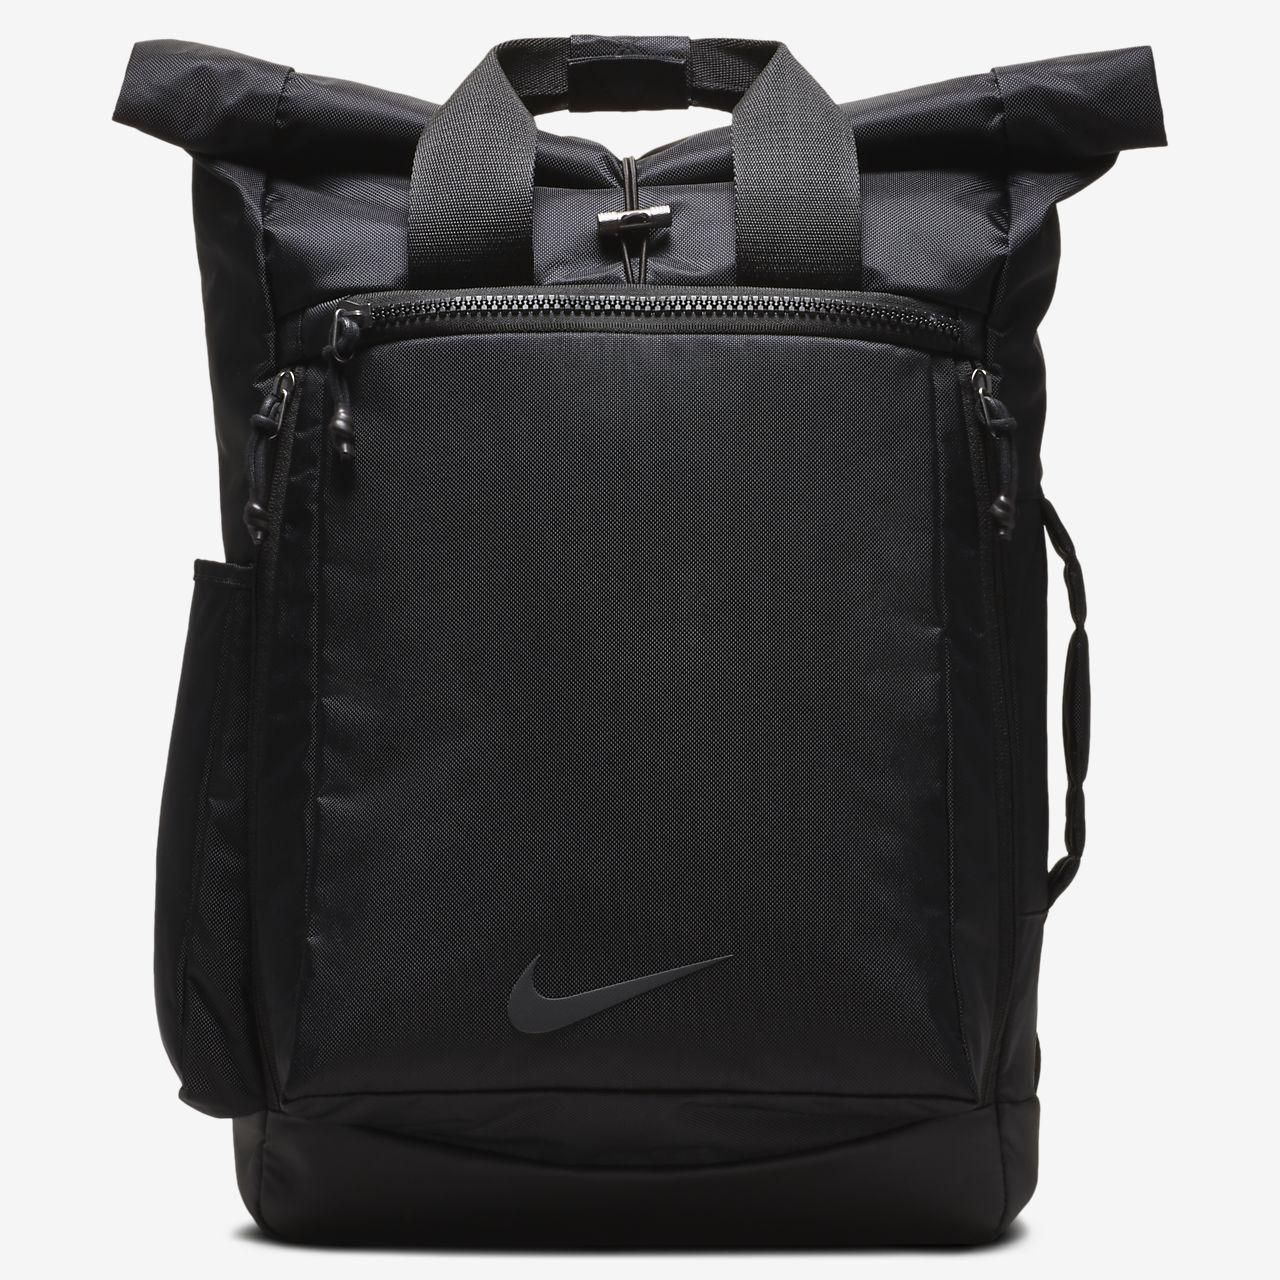 Nike Vapor Energy 2.0 Mochila de entrenamiento